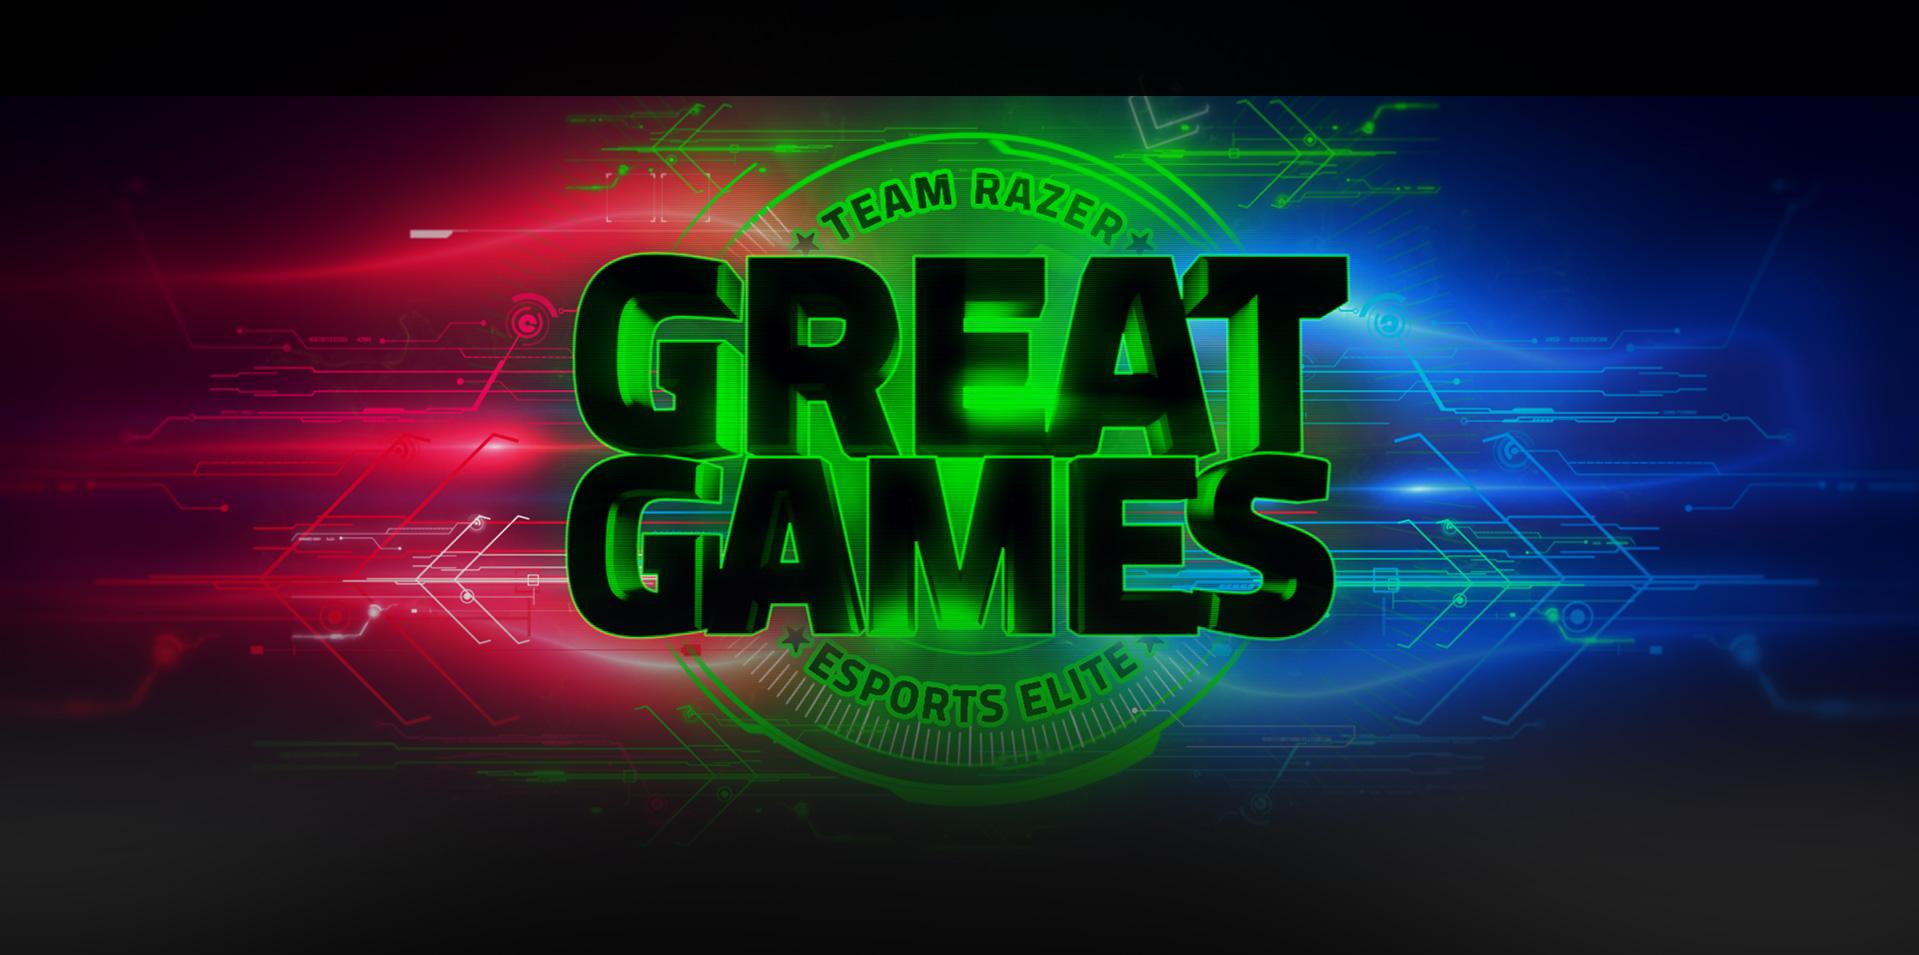 Team Razer Great Games Giveaway